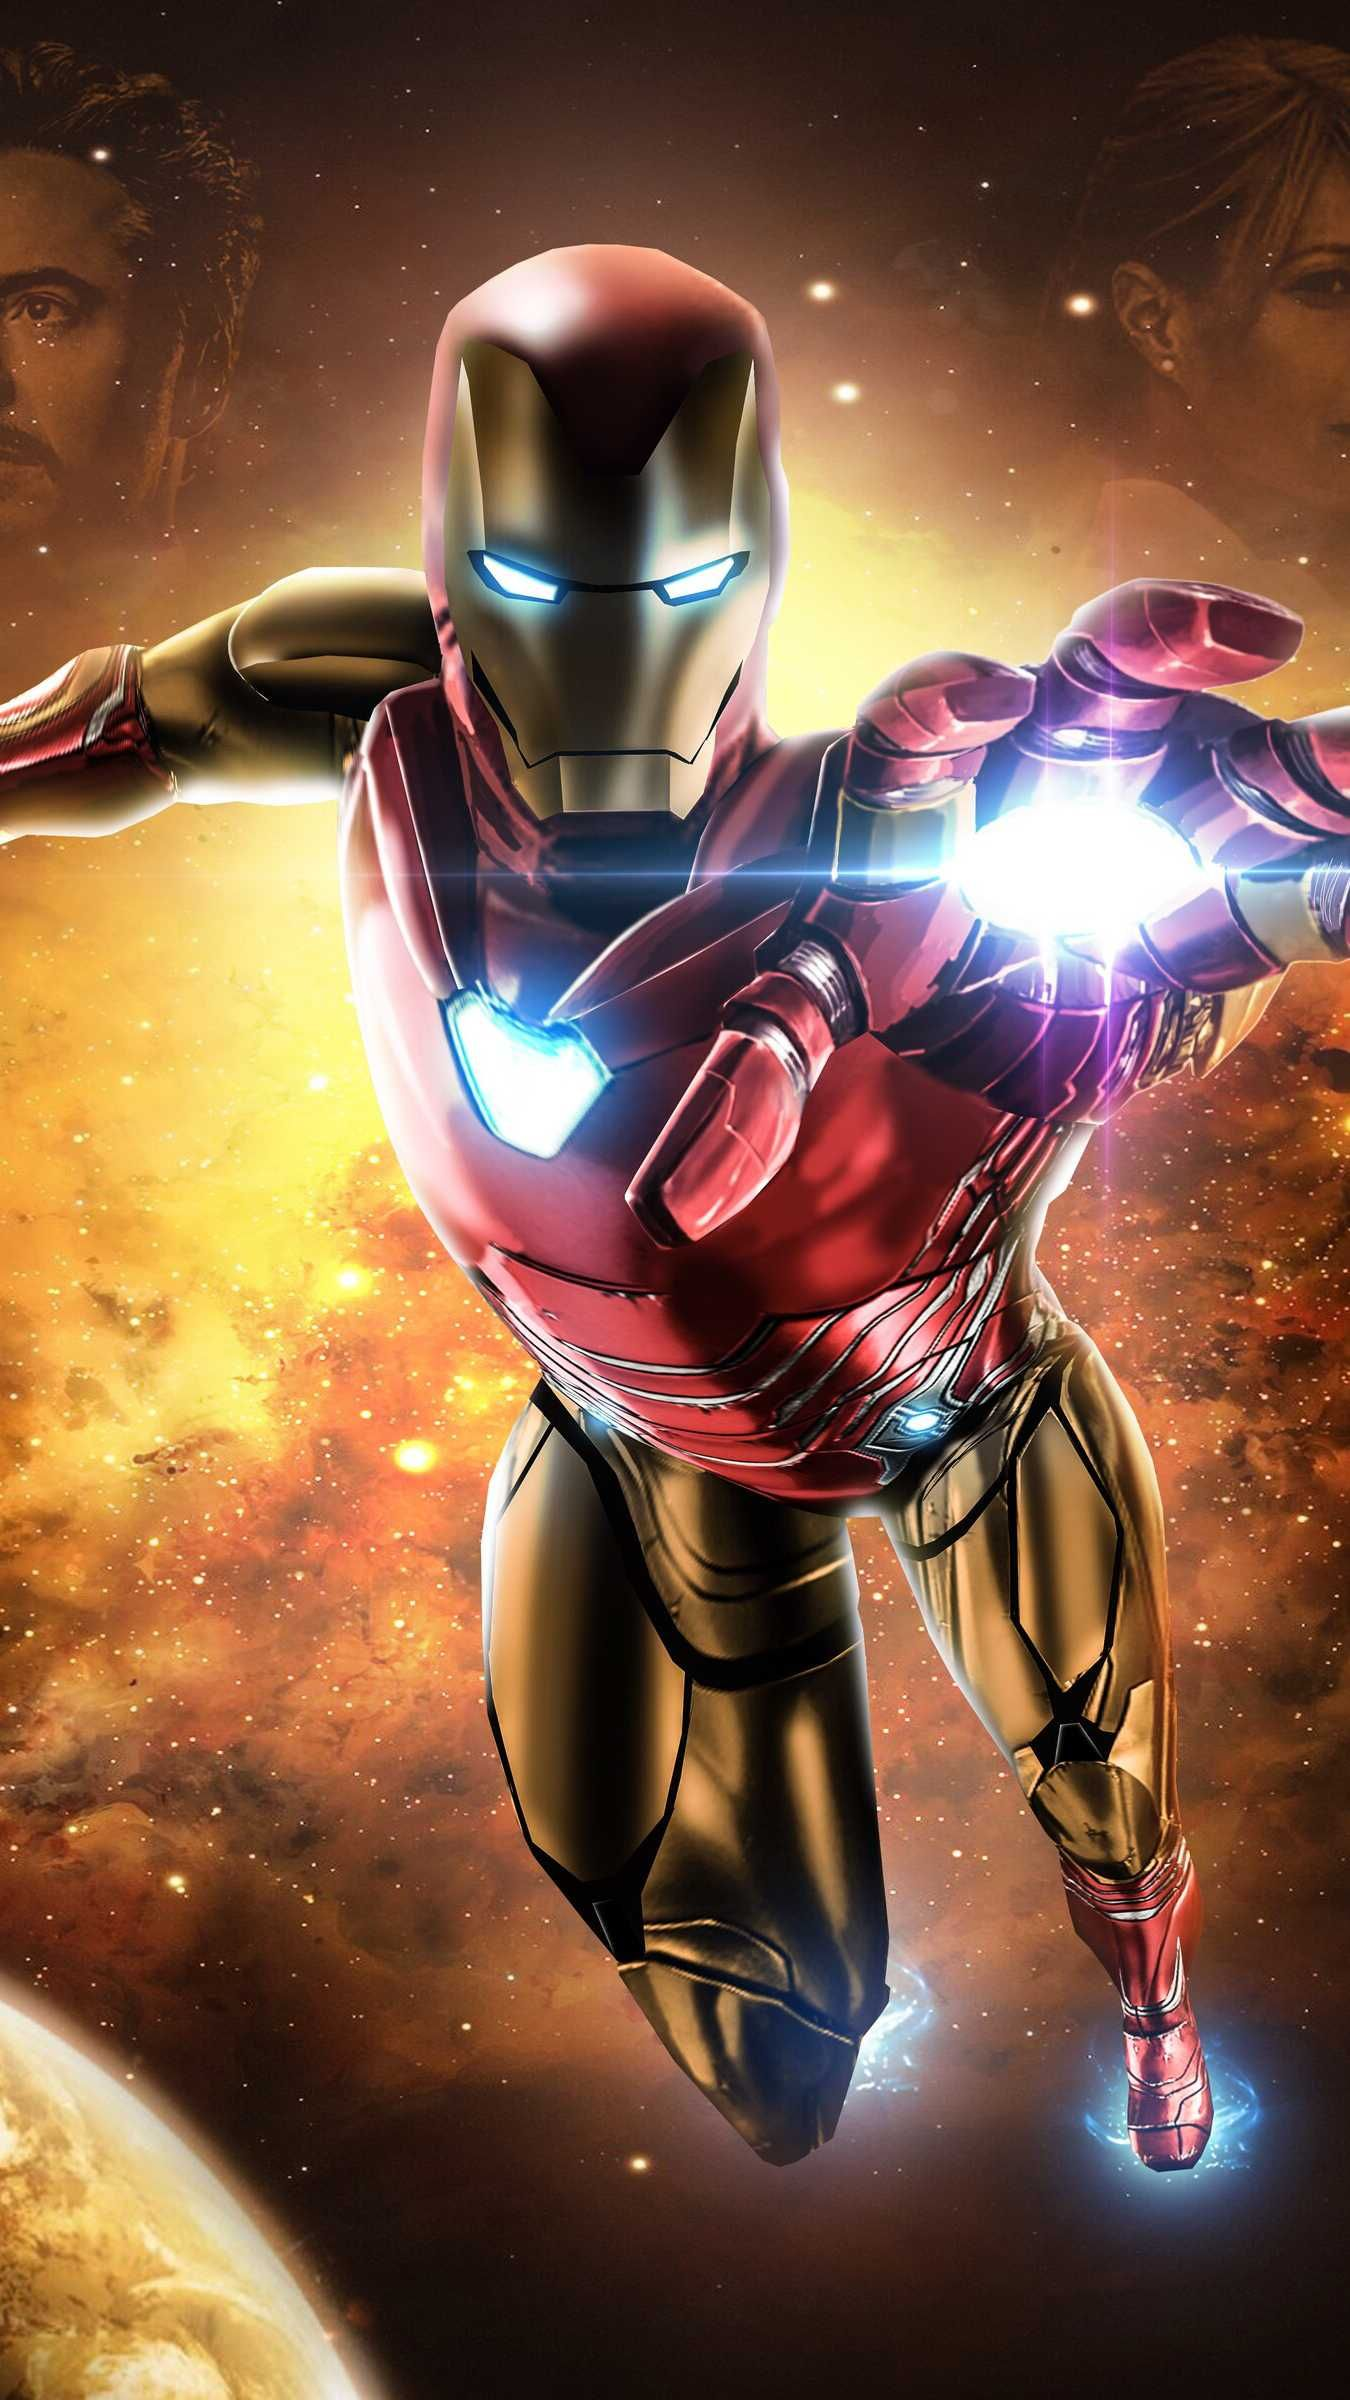 Avengers Endgame Iron Man Mark 85 Armor Space Iphone Wallpaper Iron Man Wallpaper Iron Man Art Iron Man Armor